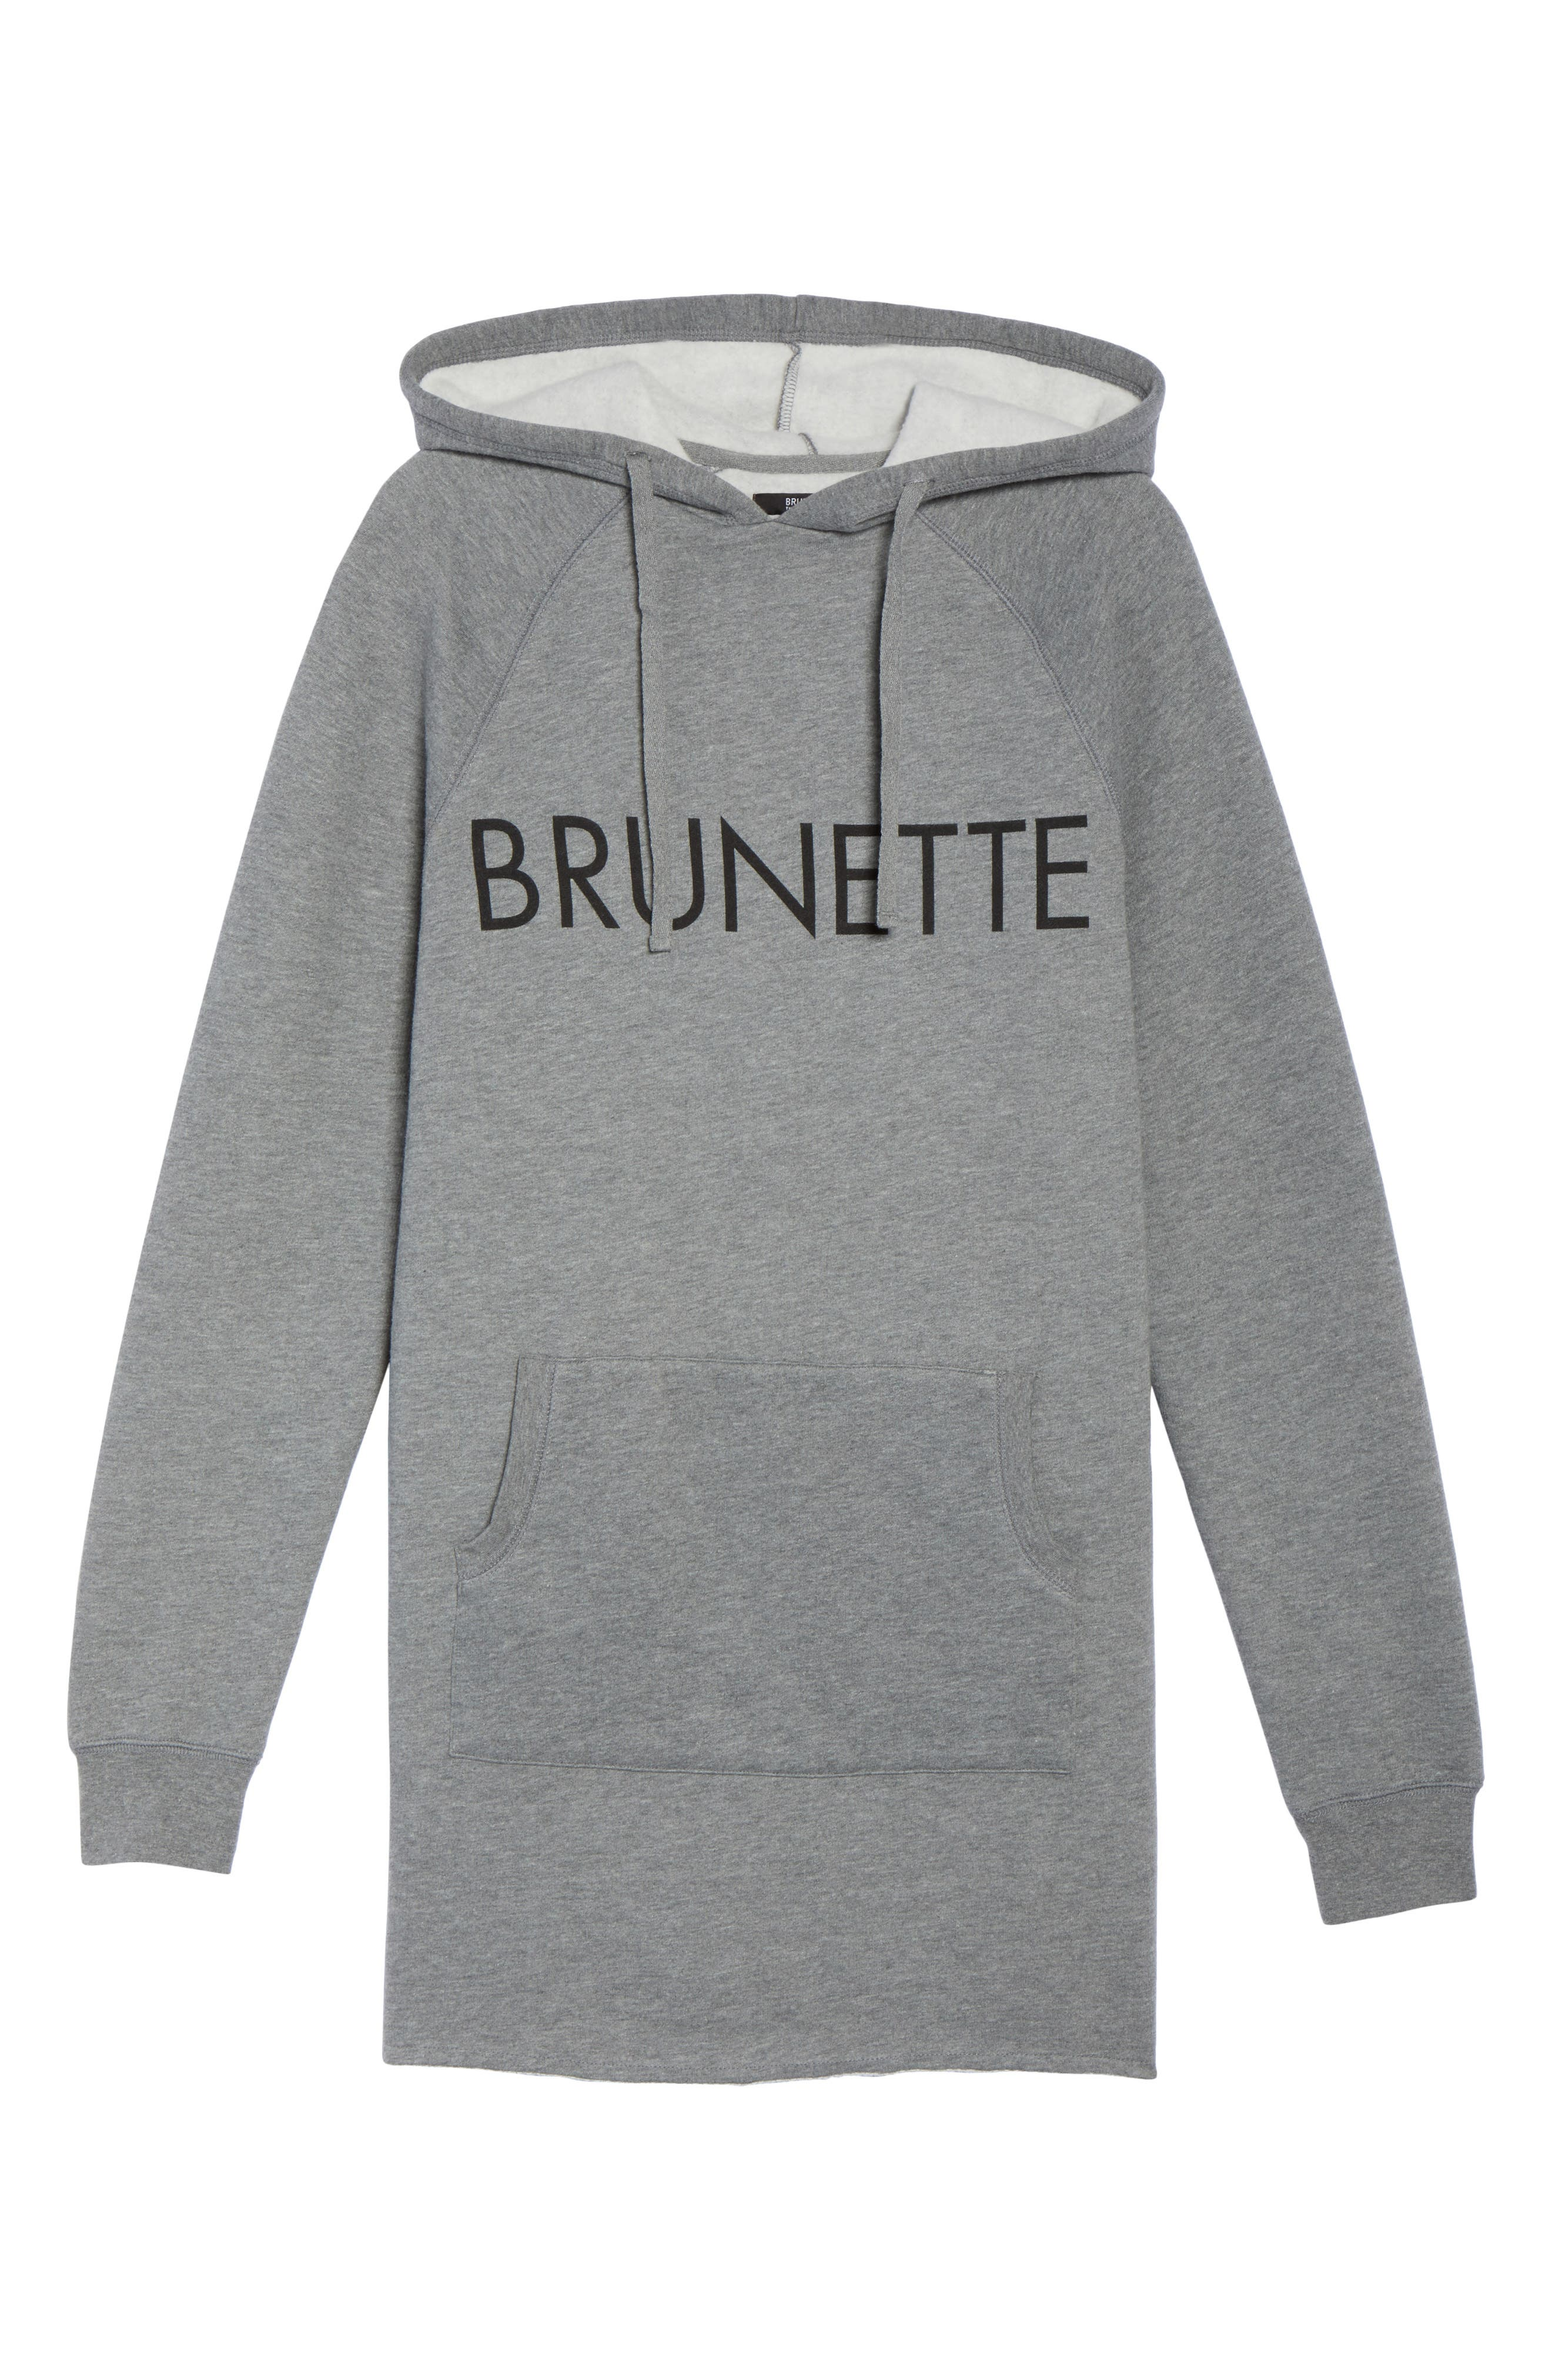 Brunette Sweatshirt Dress,                             Alternate thumbnail 6, color,                             020